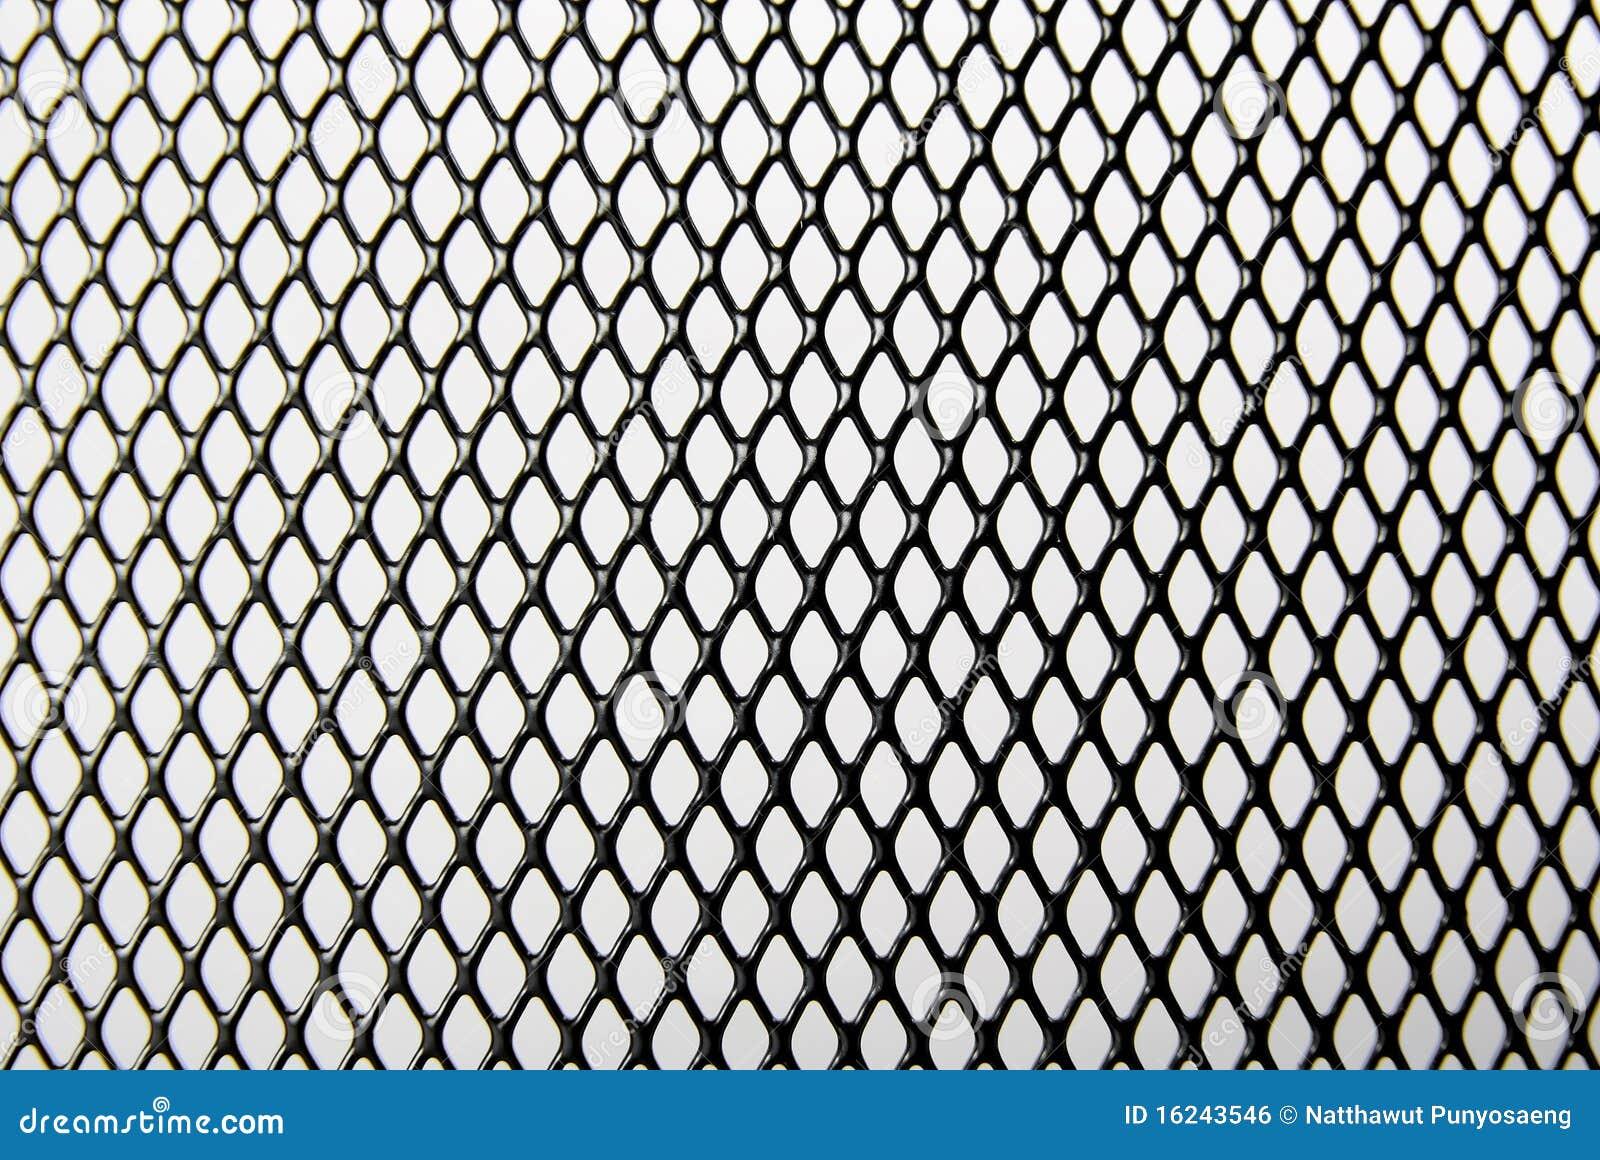 Black iron wire pattern royalty free stock image